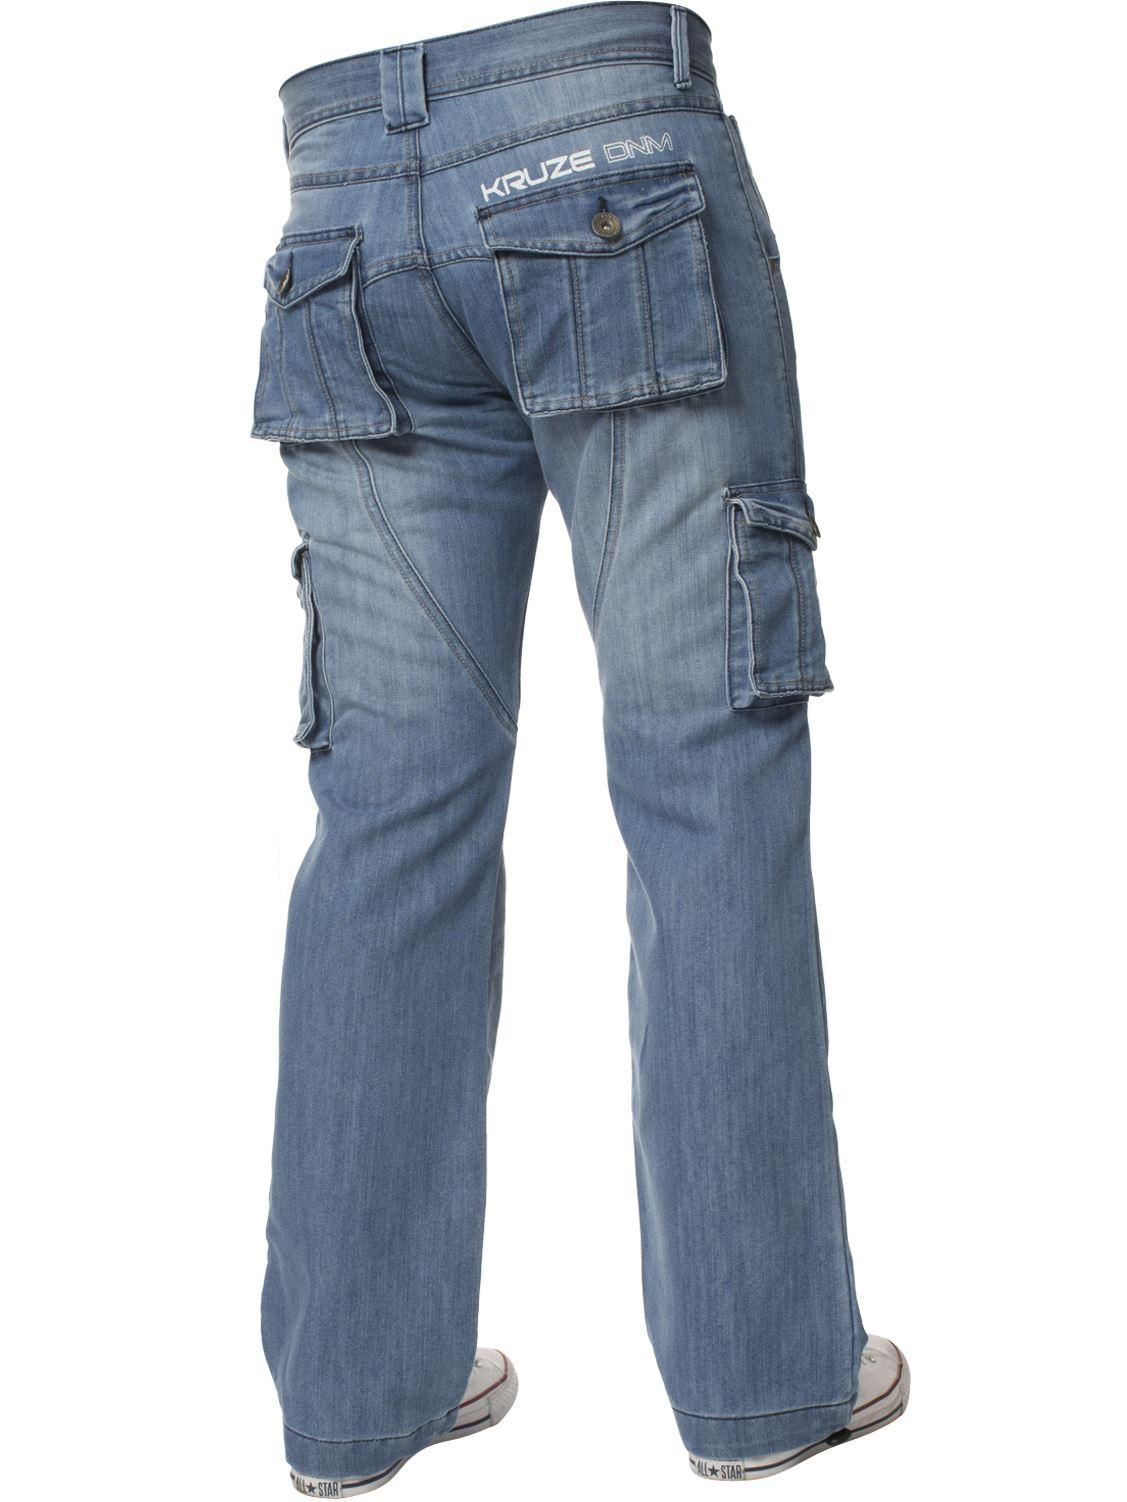 Grandes-jeans-para-hombre-de-combate-de-Kruze-Rey-Alto-Pierna-Cargo-Pantalones-Jeans-Pantalones miniatura 30